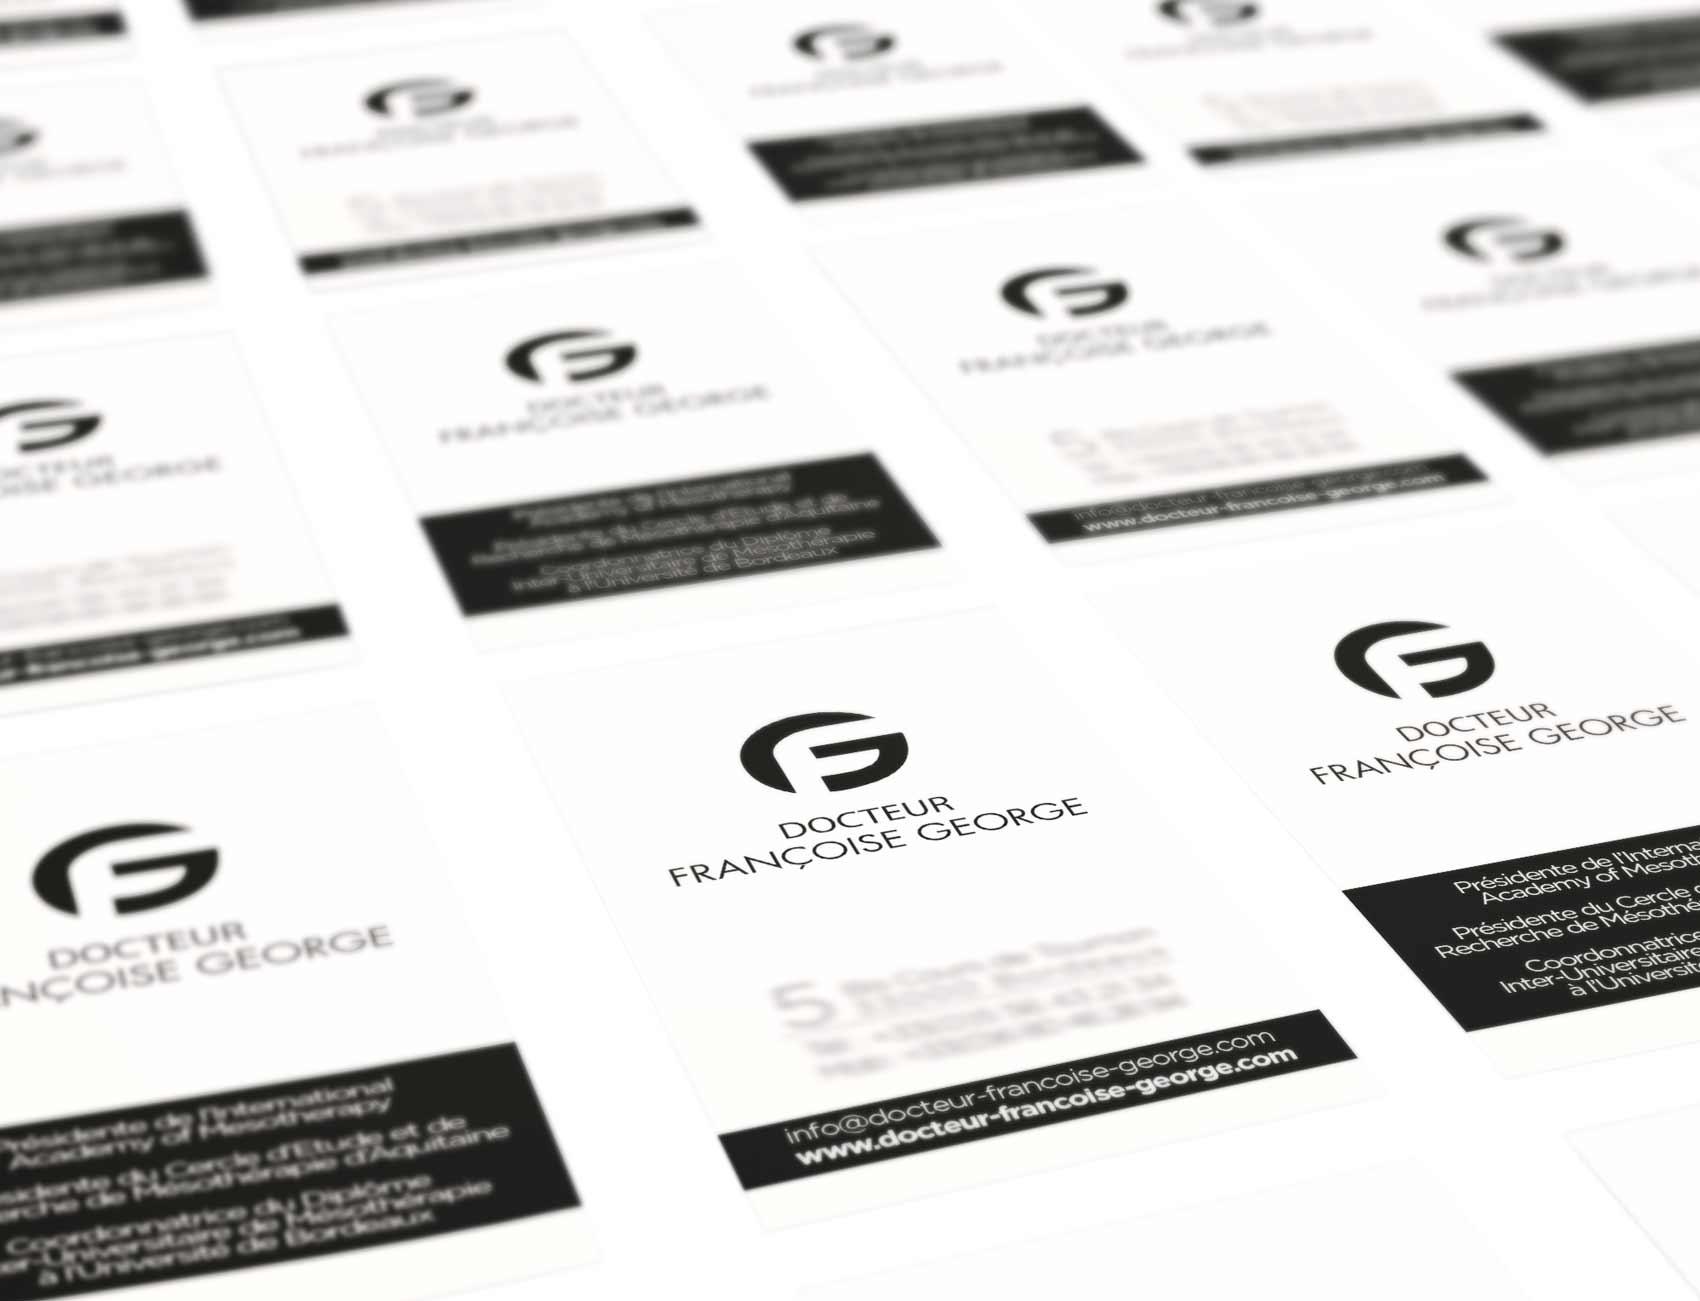 carte-de-visite-dr-george-agence-sante-karma-communication-nice-paris